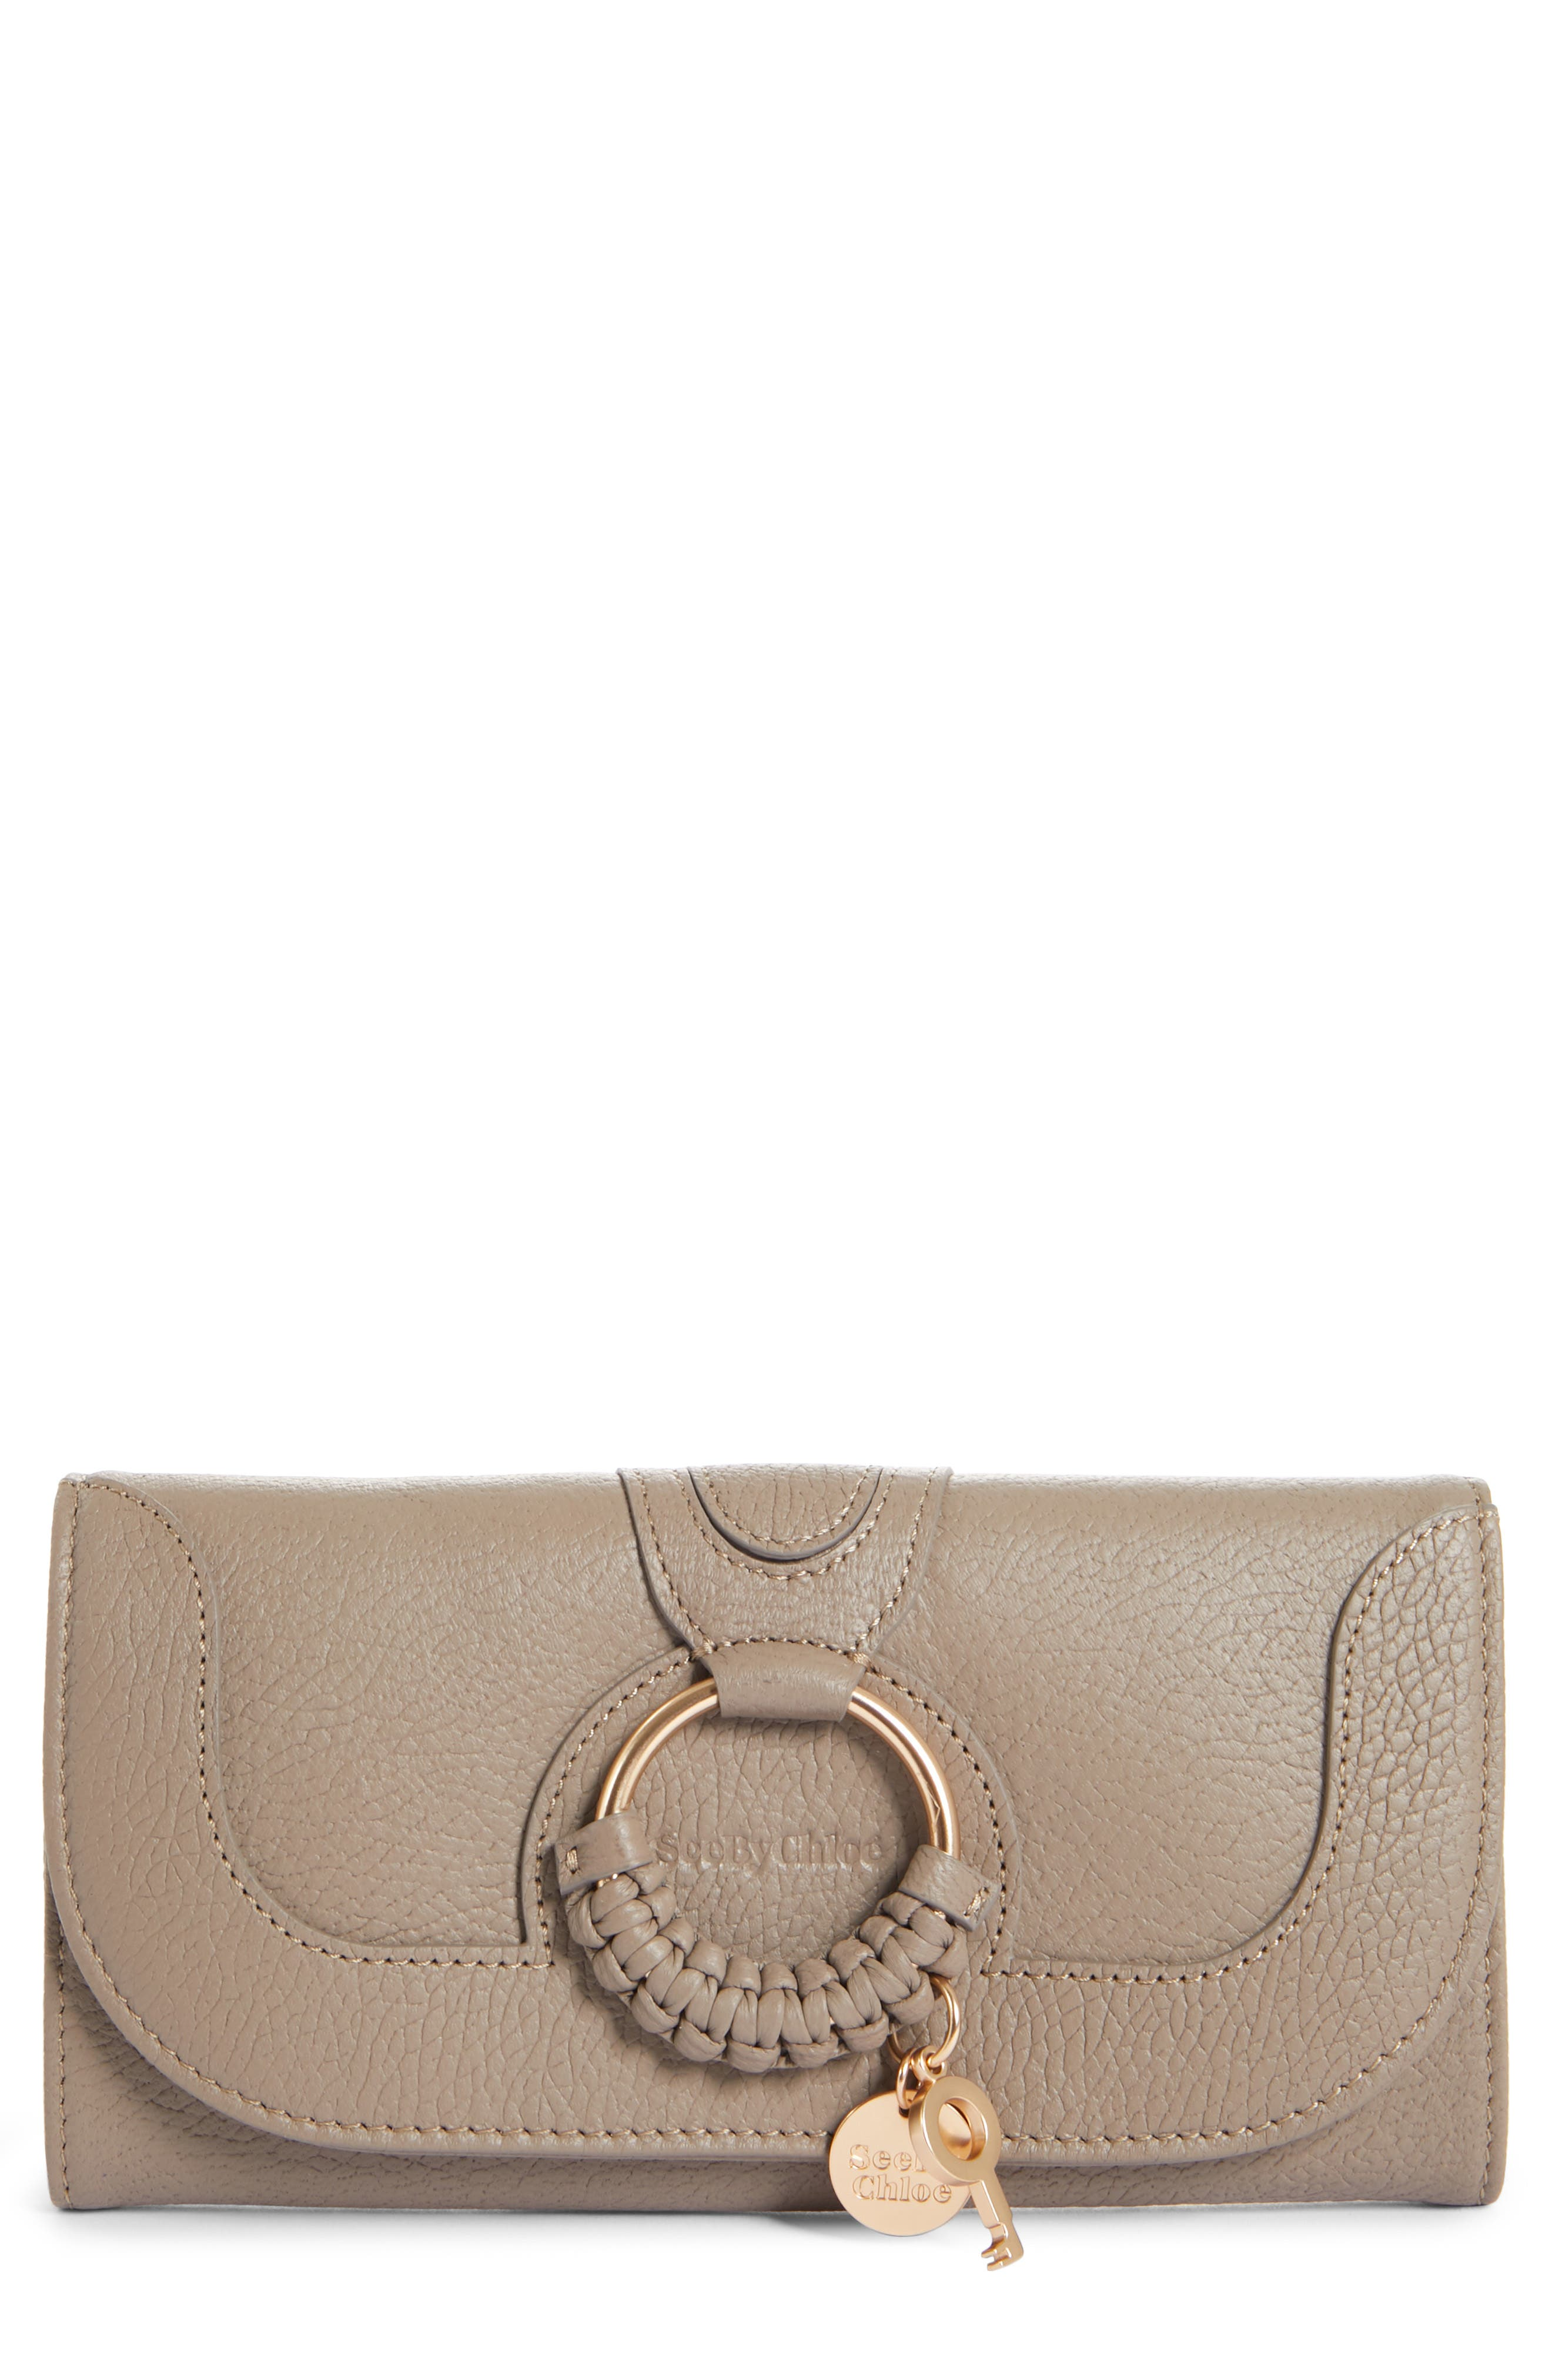 Hana Large Leather Wallet,                             Main thumbnail 1, color,                             MOTTY GREY